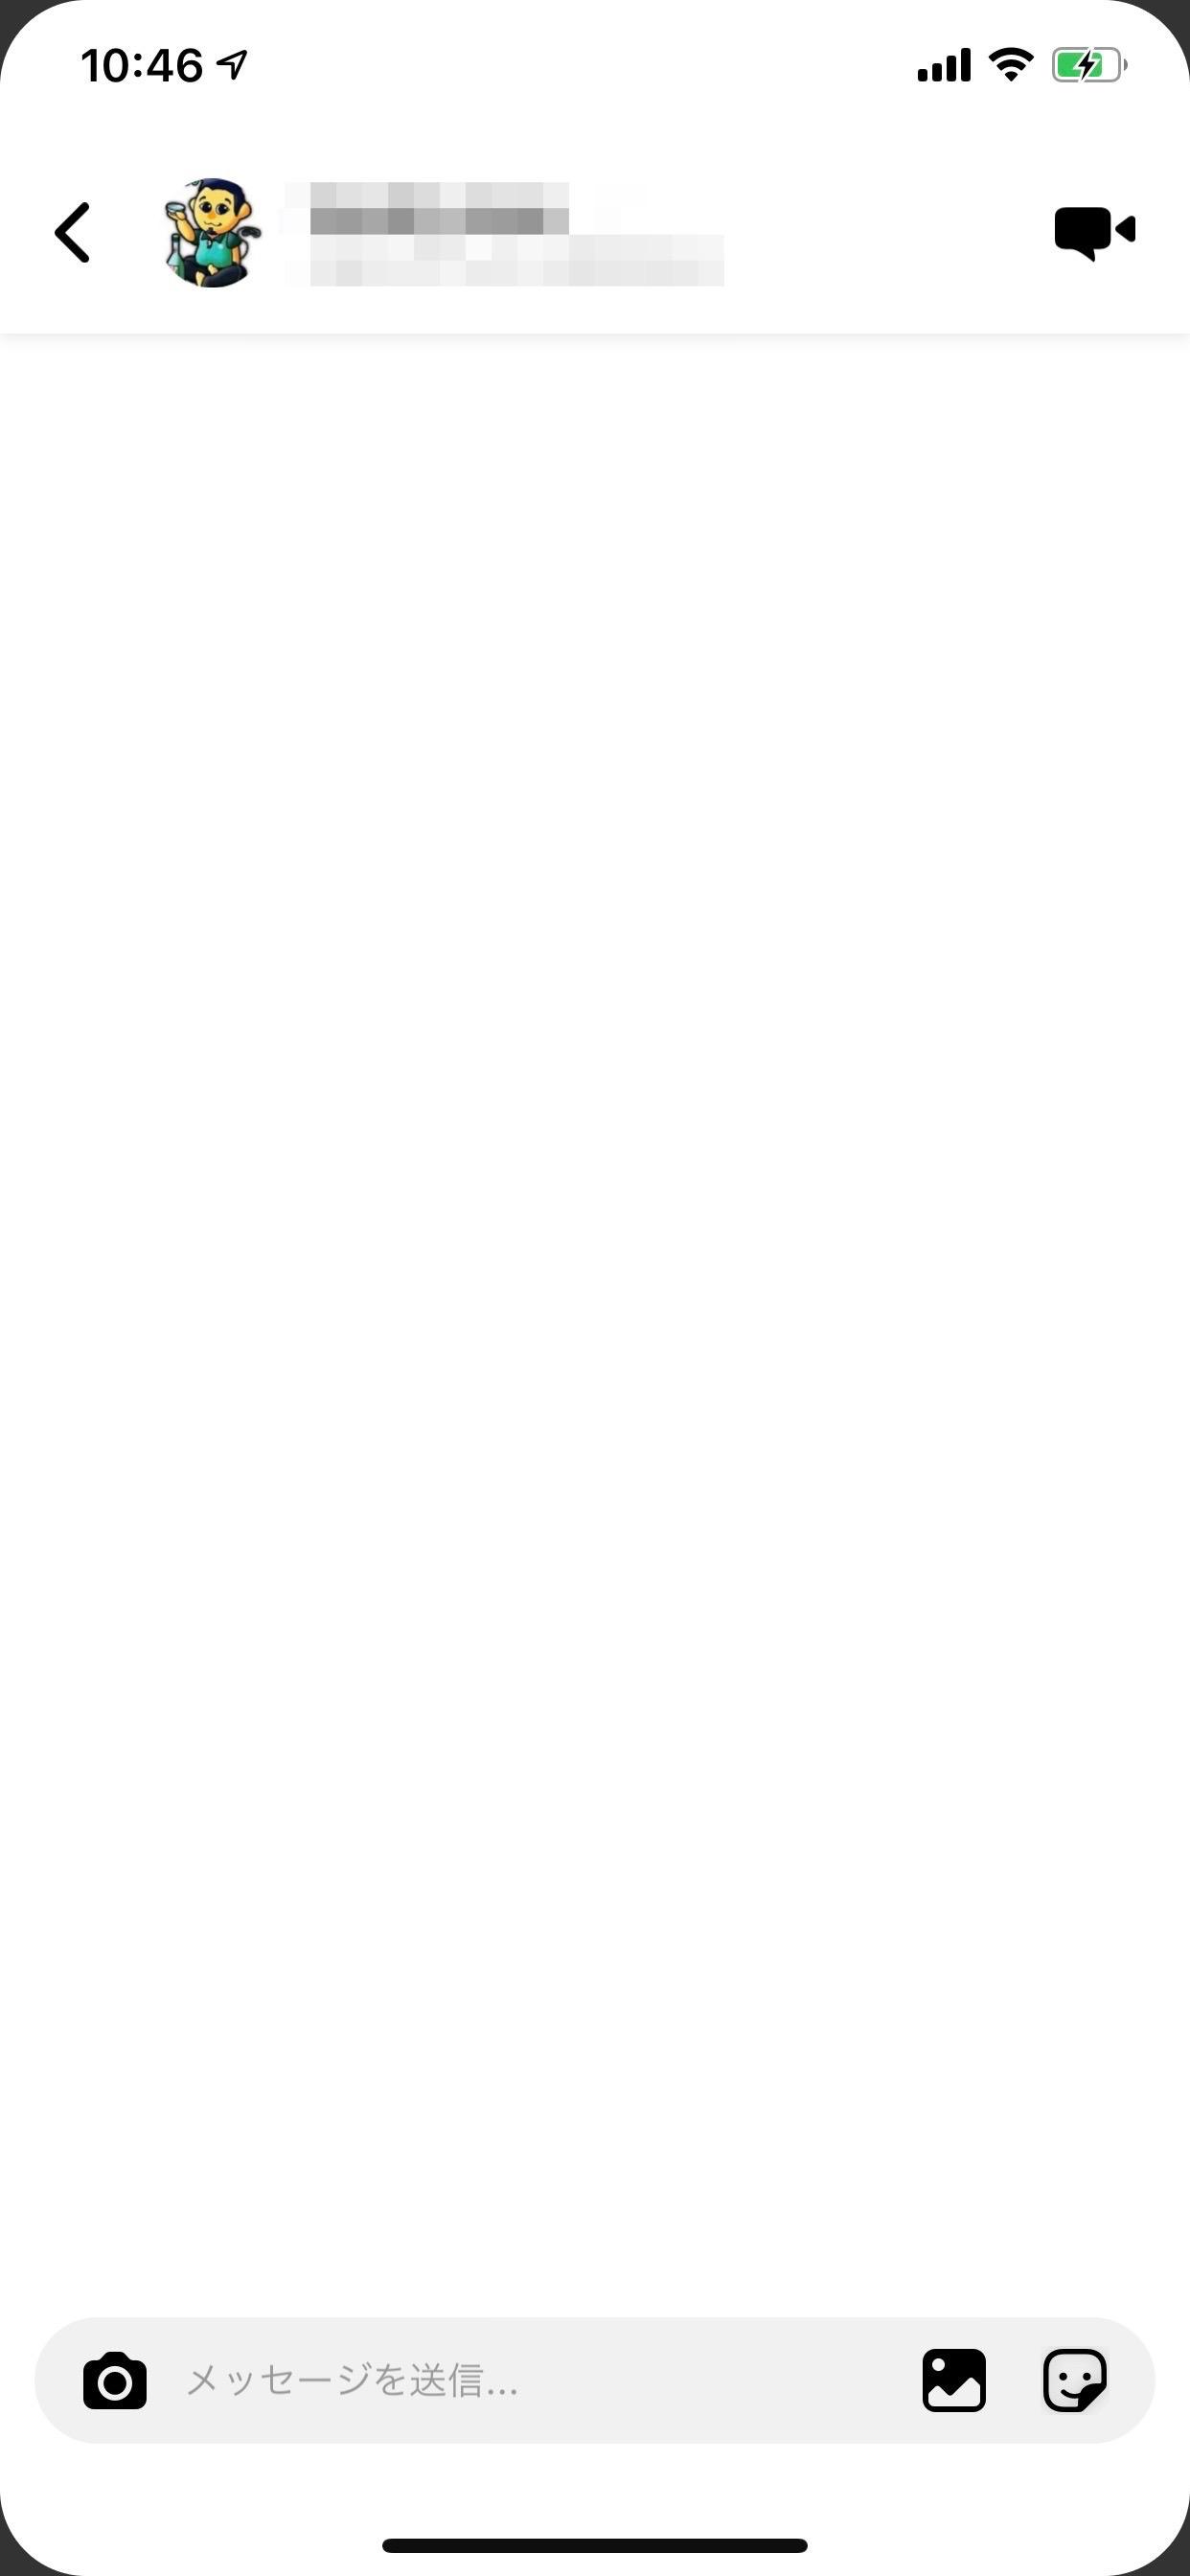 Instagramのメッセンジャーアプリ「Threads(スレッズ)」6